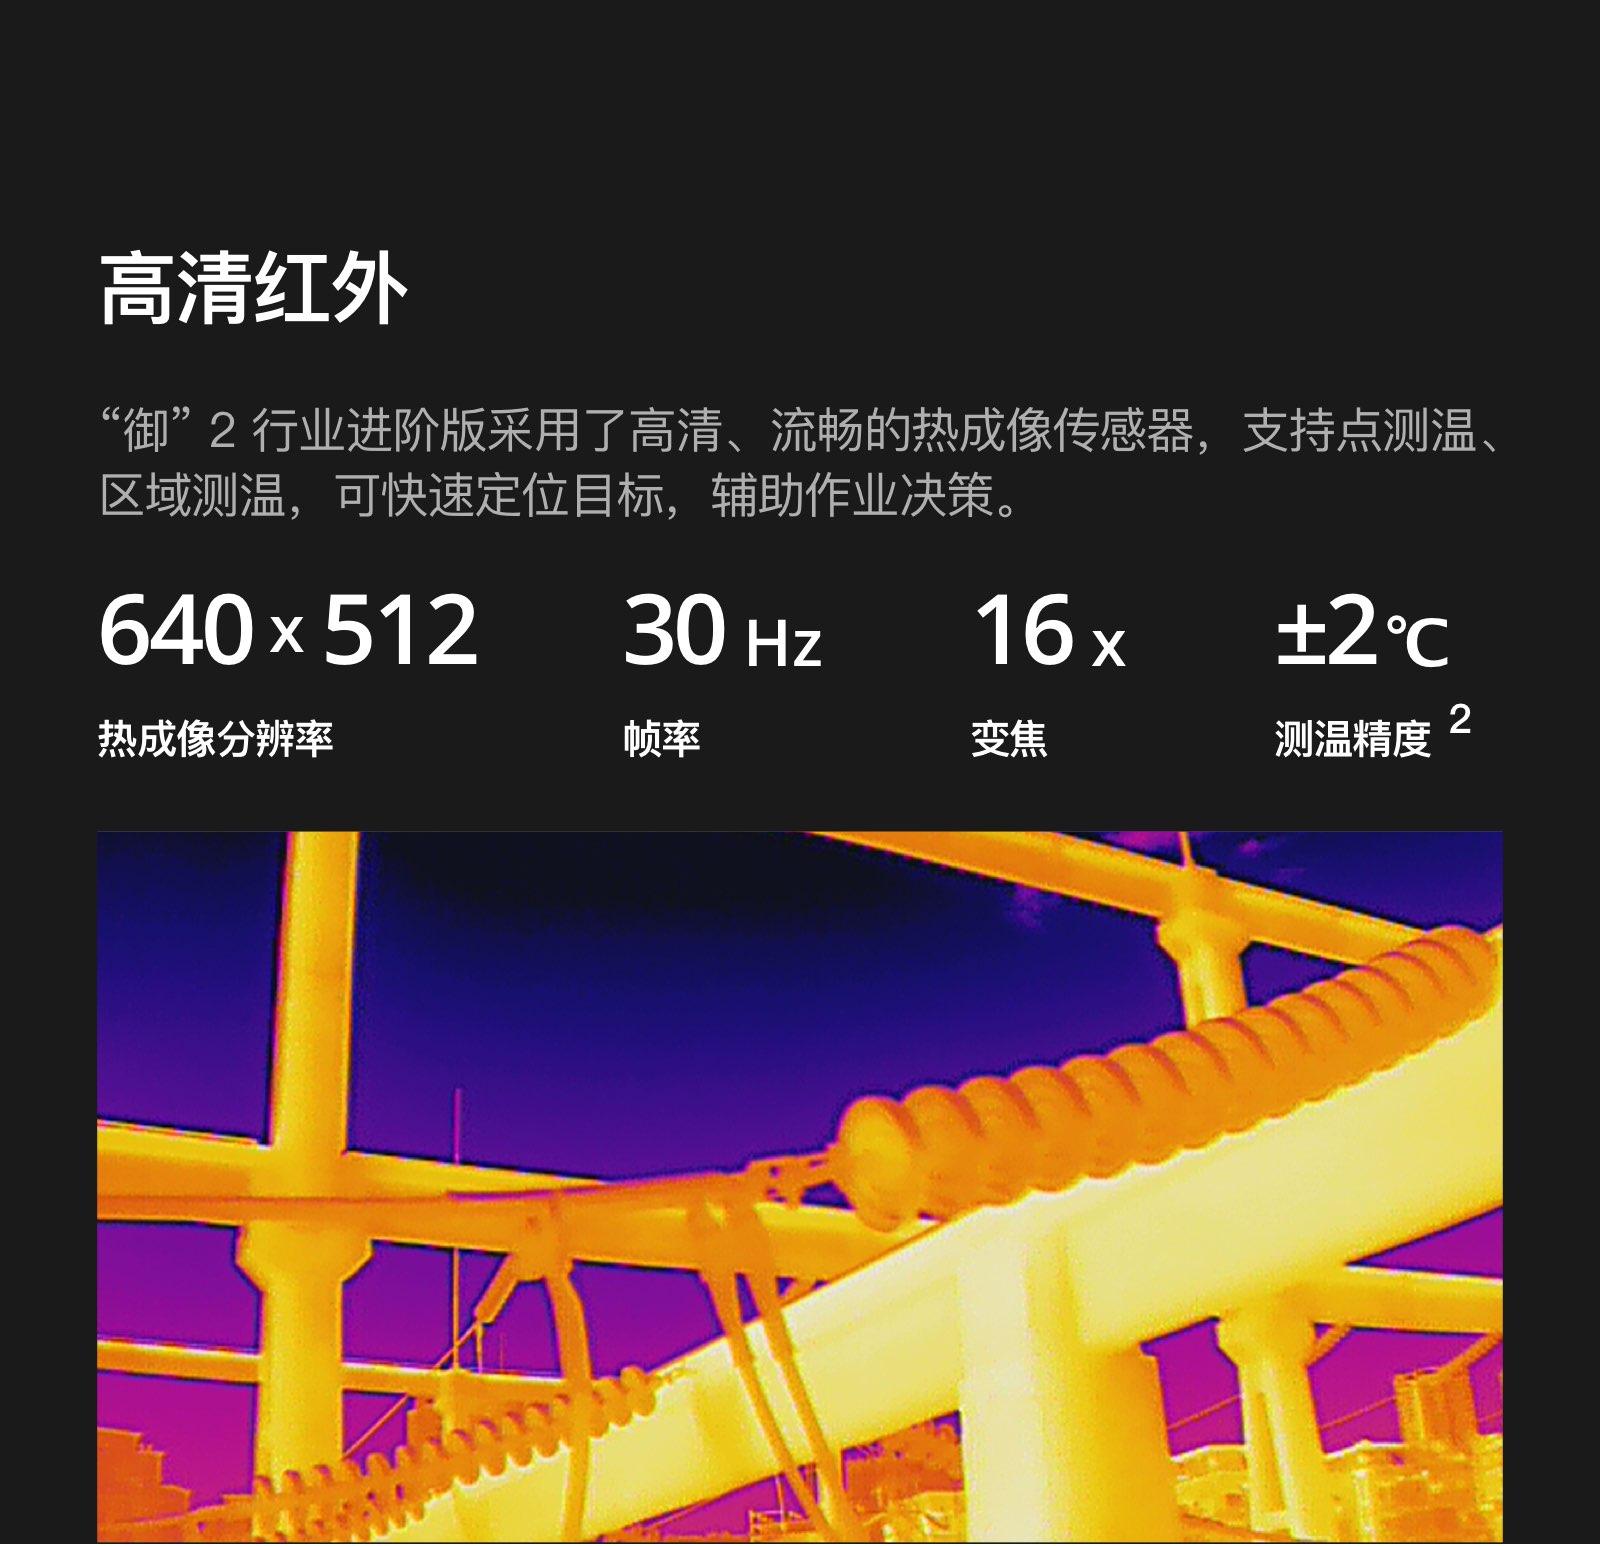 M2EA_PC%20_cn_4.jpg